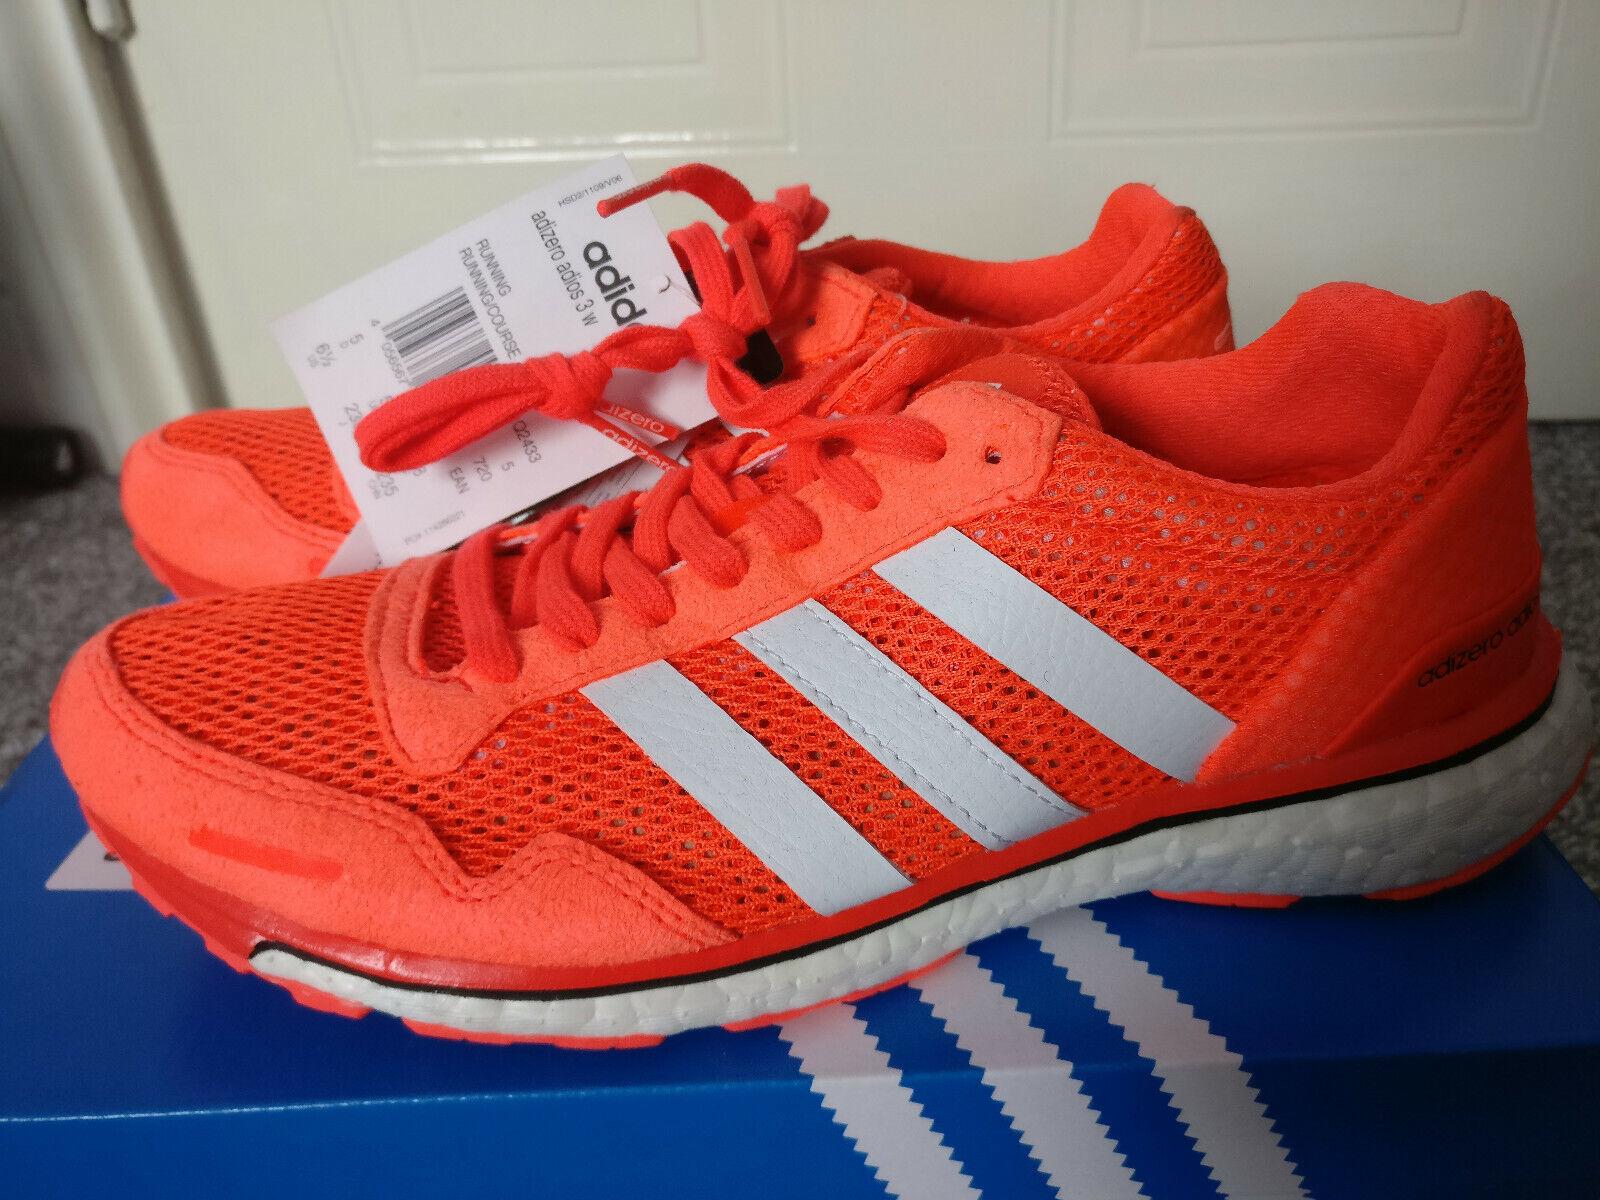 Adidas Adizero Adios 3 Running zapatos Trainers. tamaño5